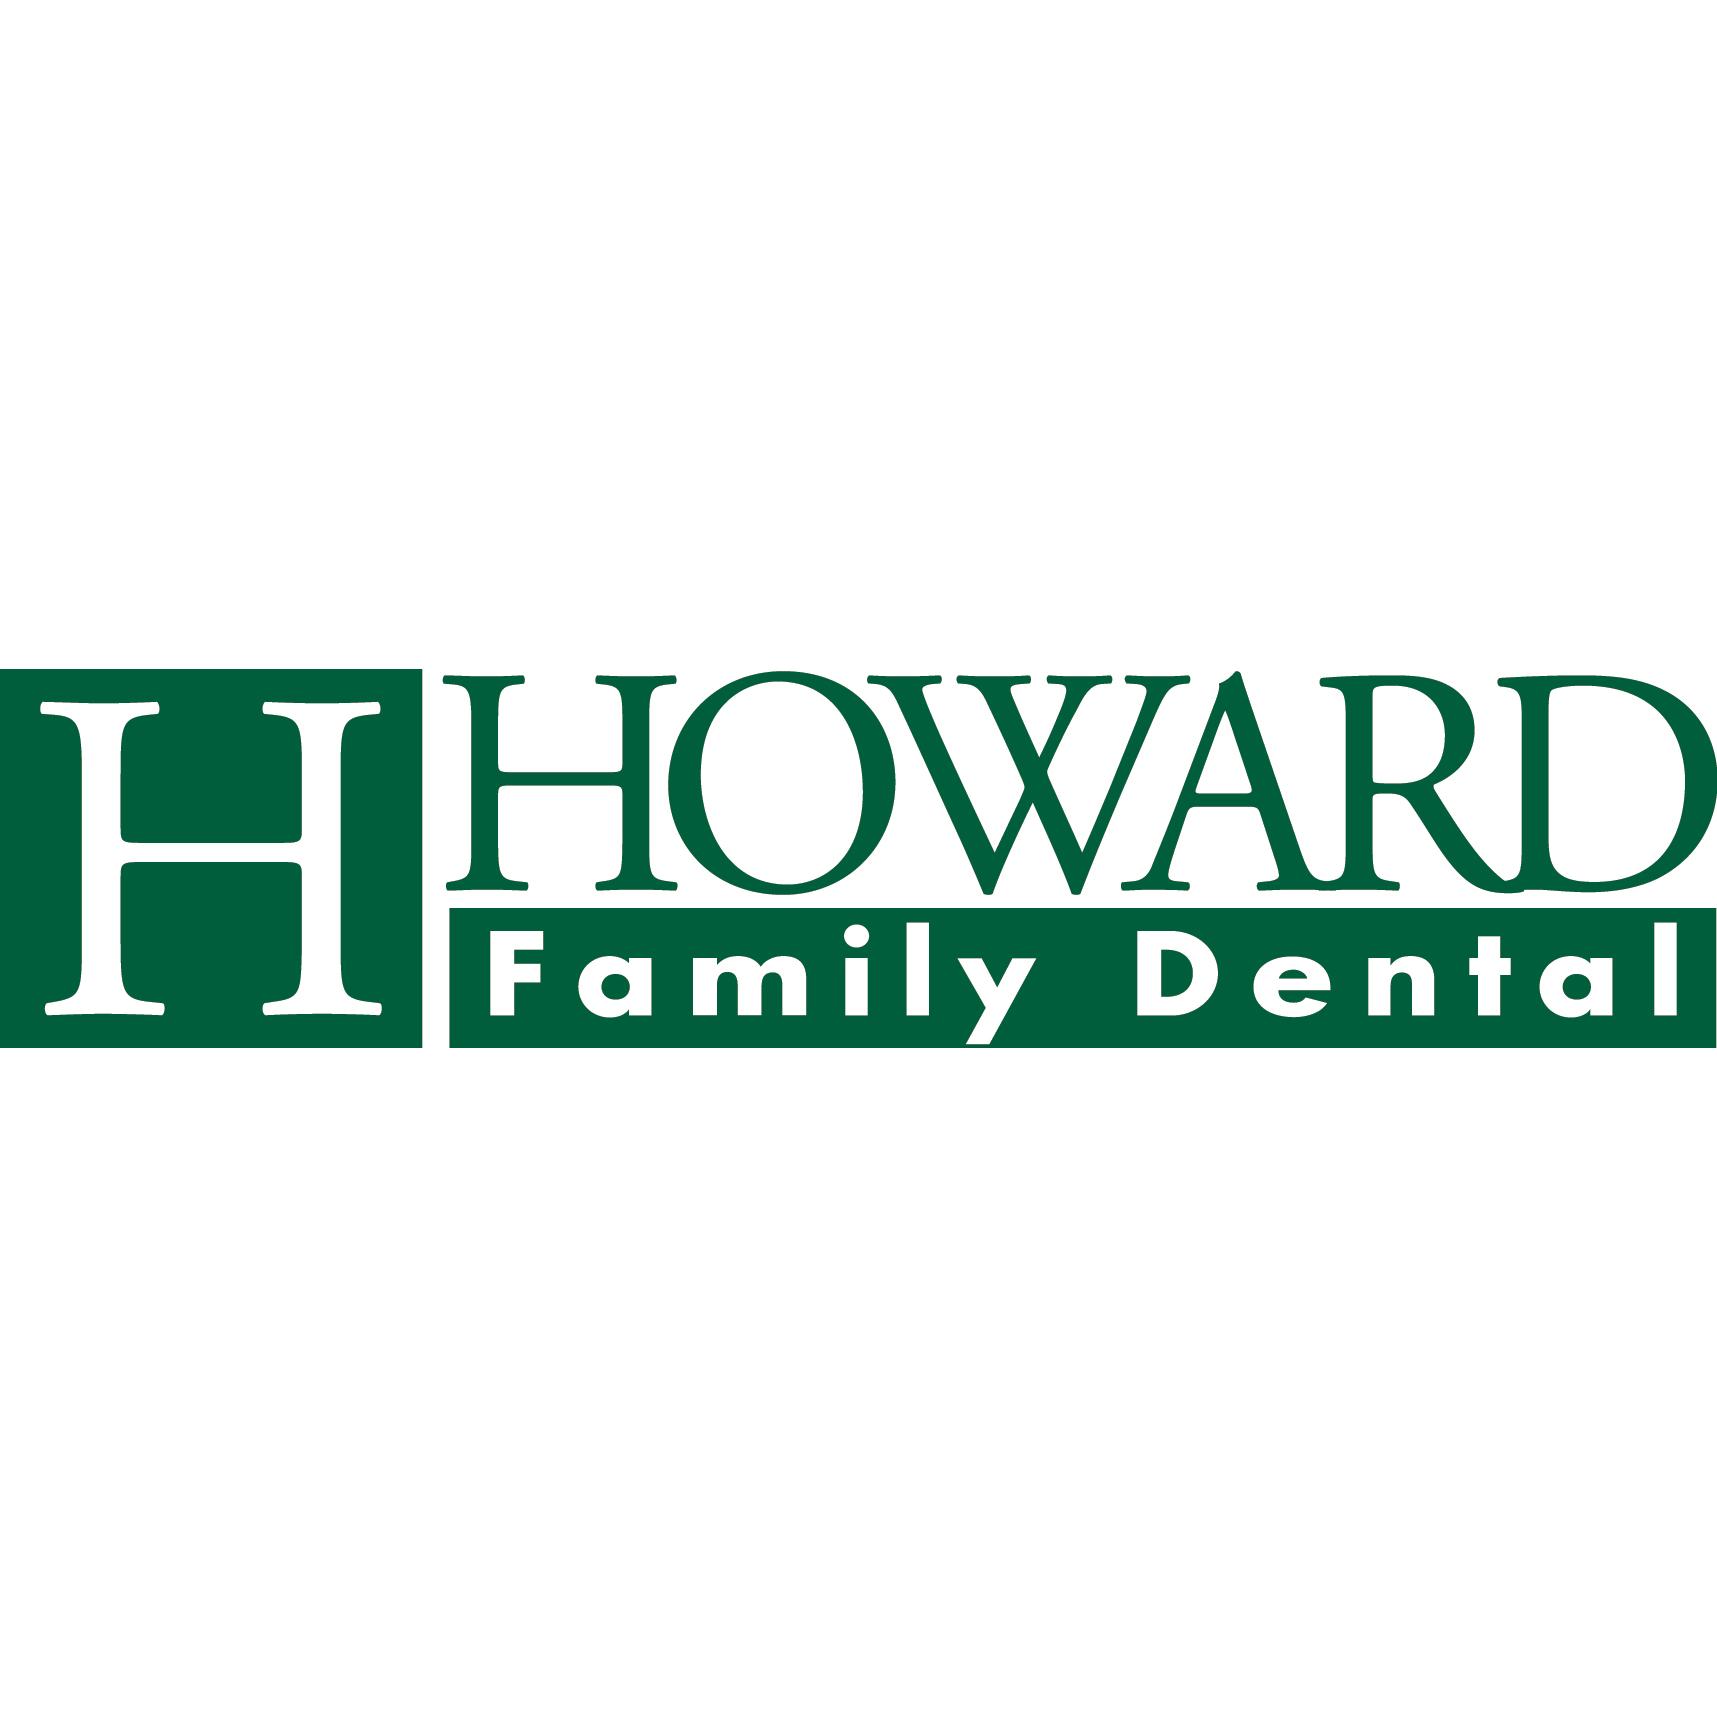 Howard Family Dental image 0